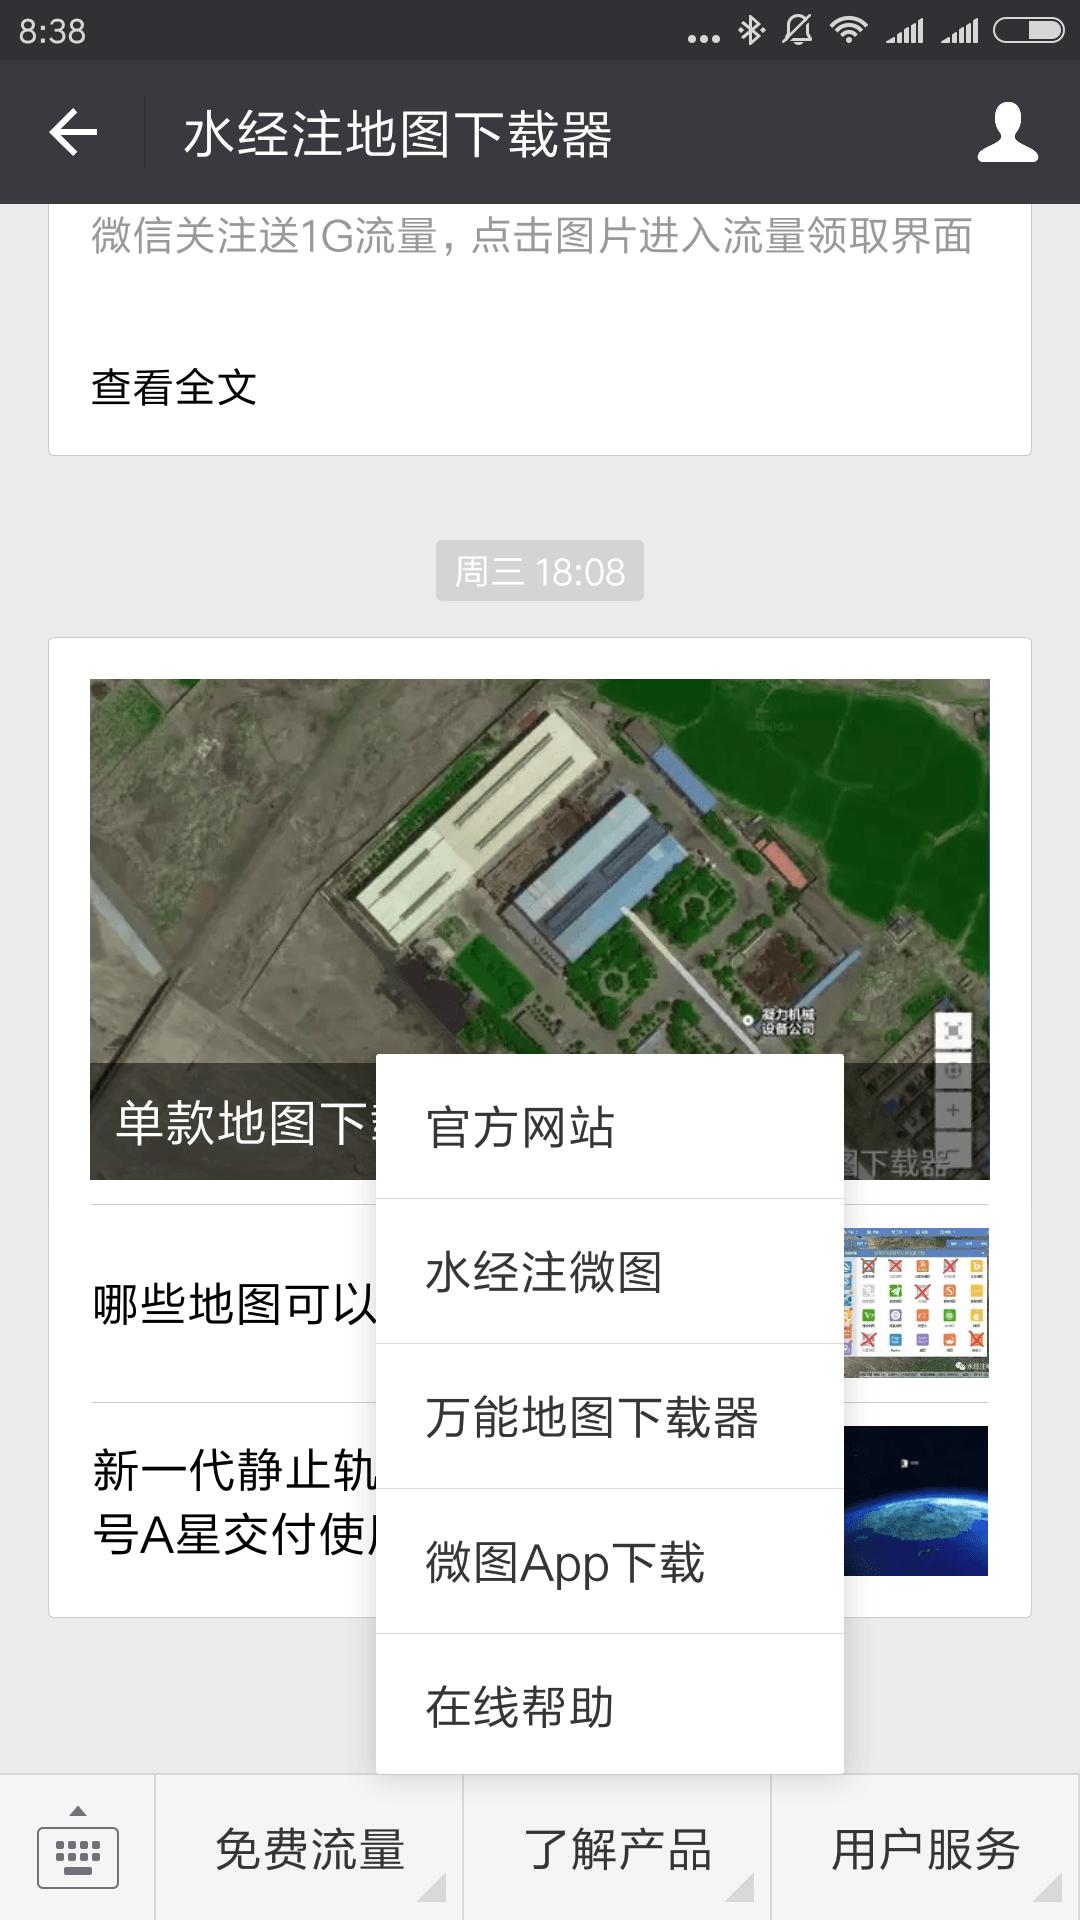 2关注微信公众号.png